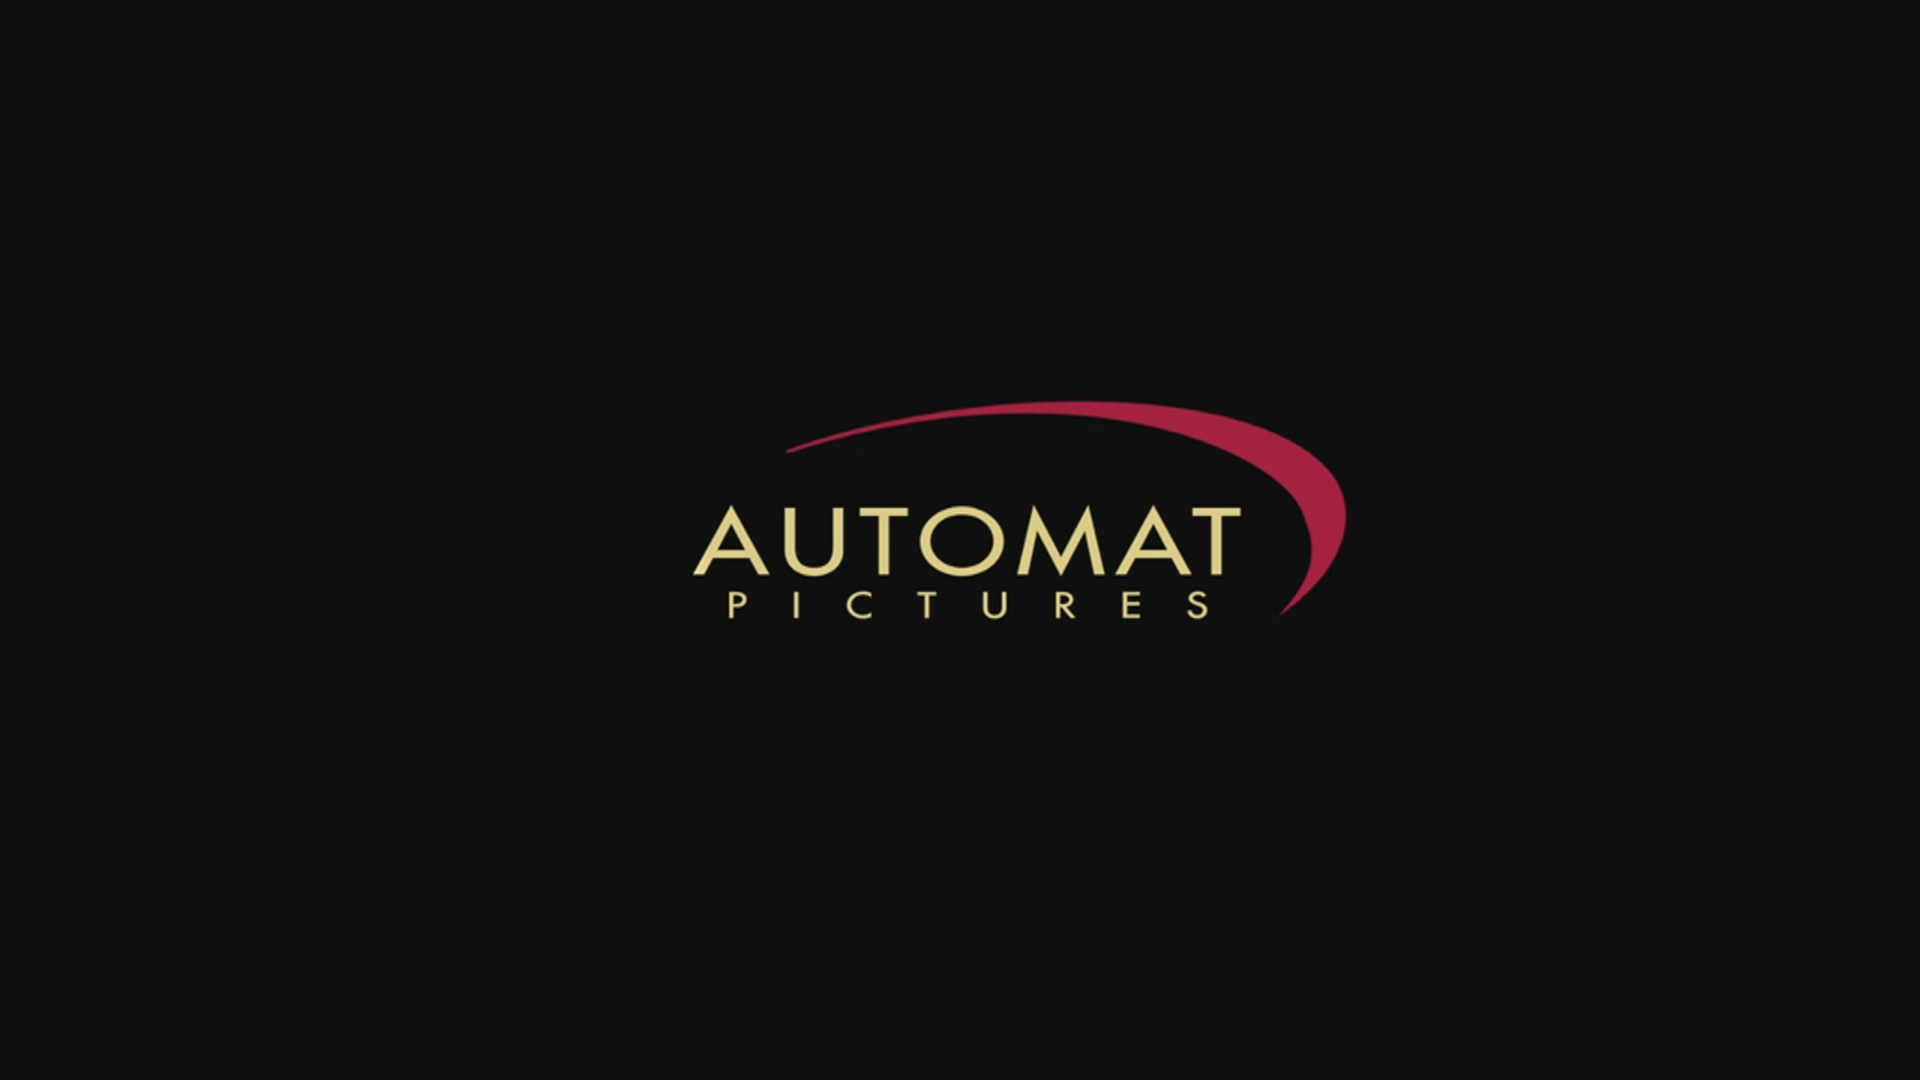 Automat Pictures